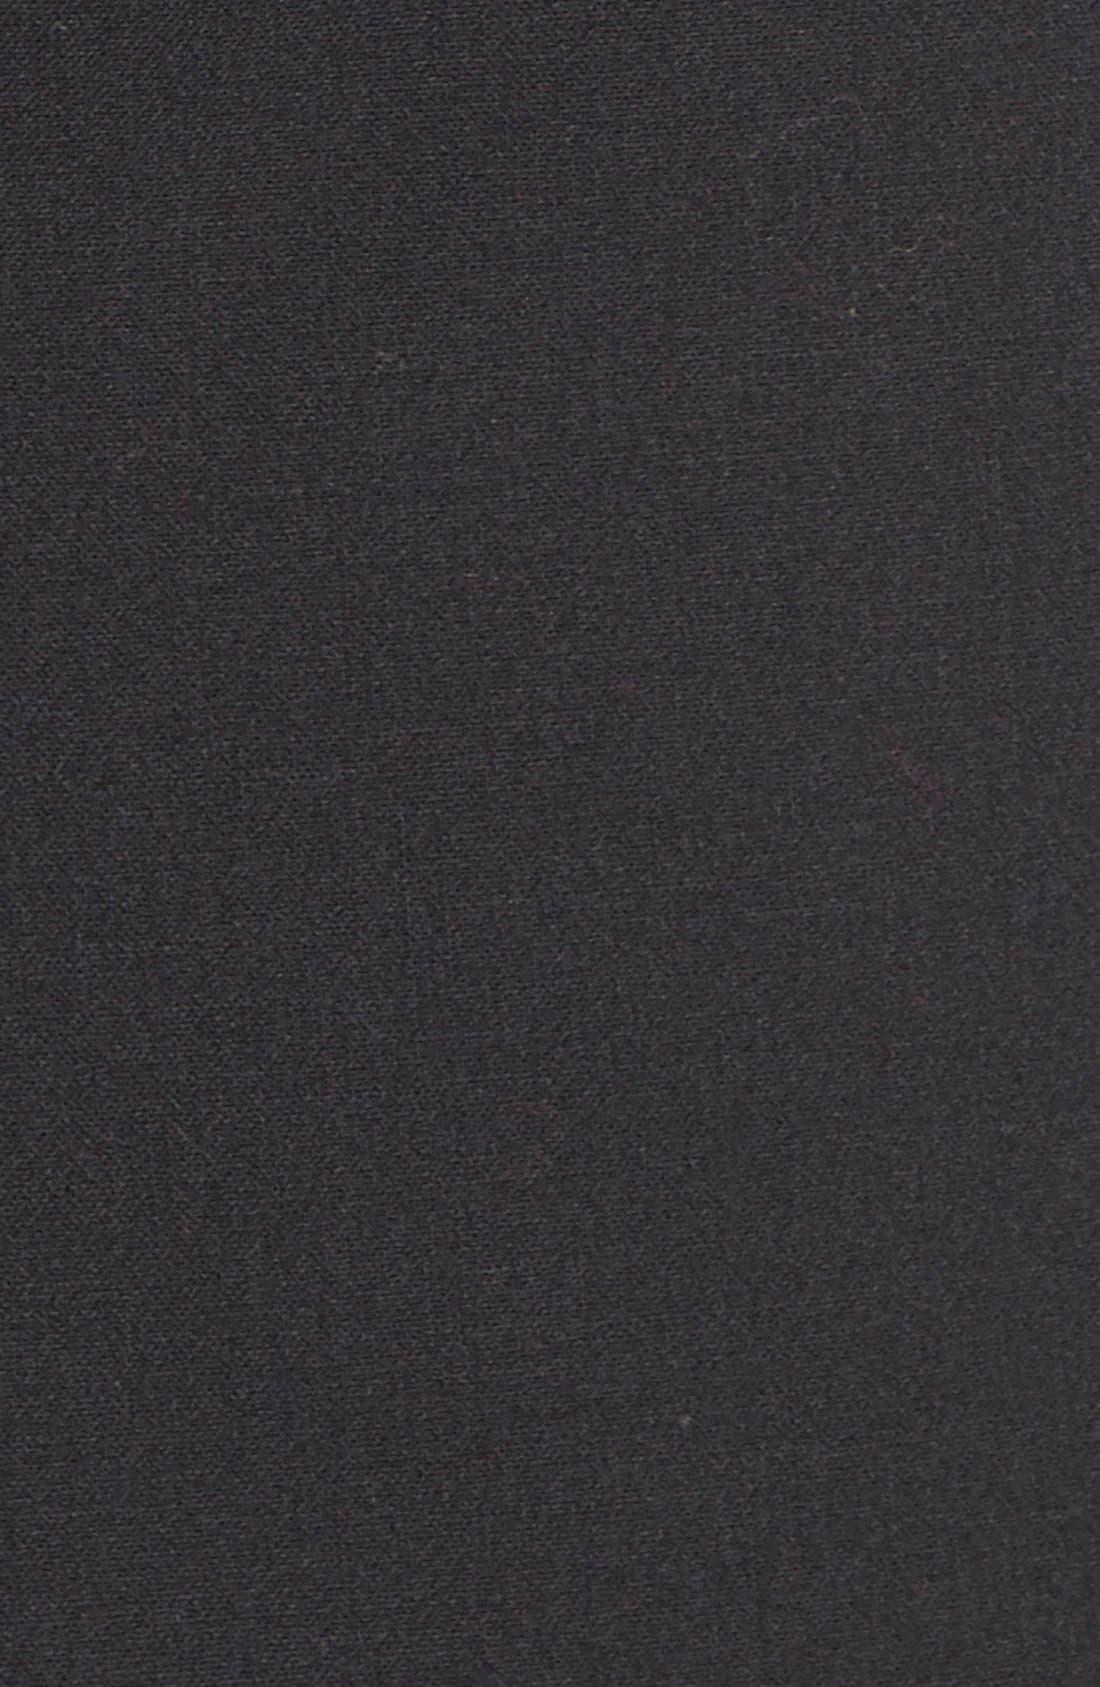 Alternate Image 4  - Lafayette 148 New York 'Gladstone' Stretch Wool Jacket (Plus Size) (Nordstrom Exclusive)